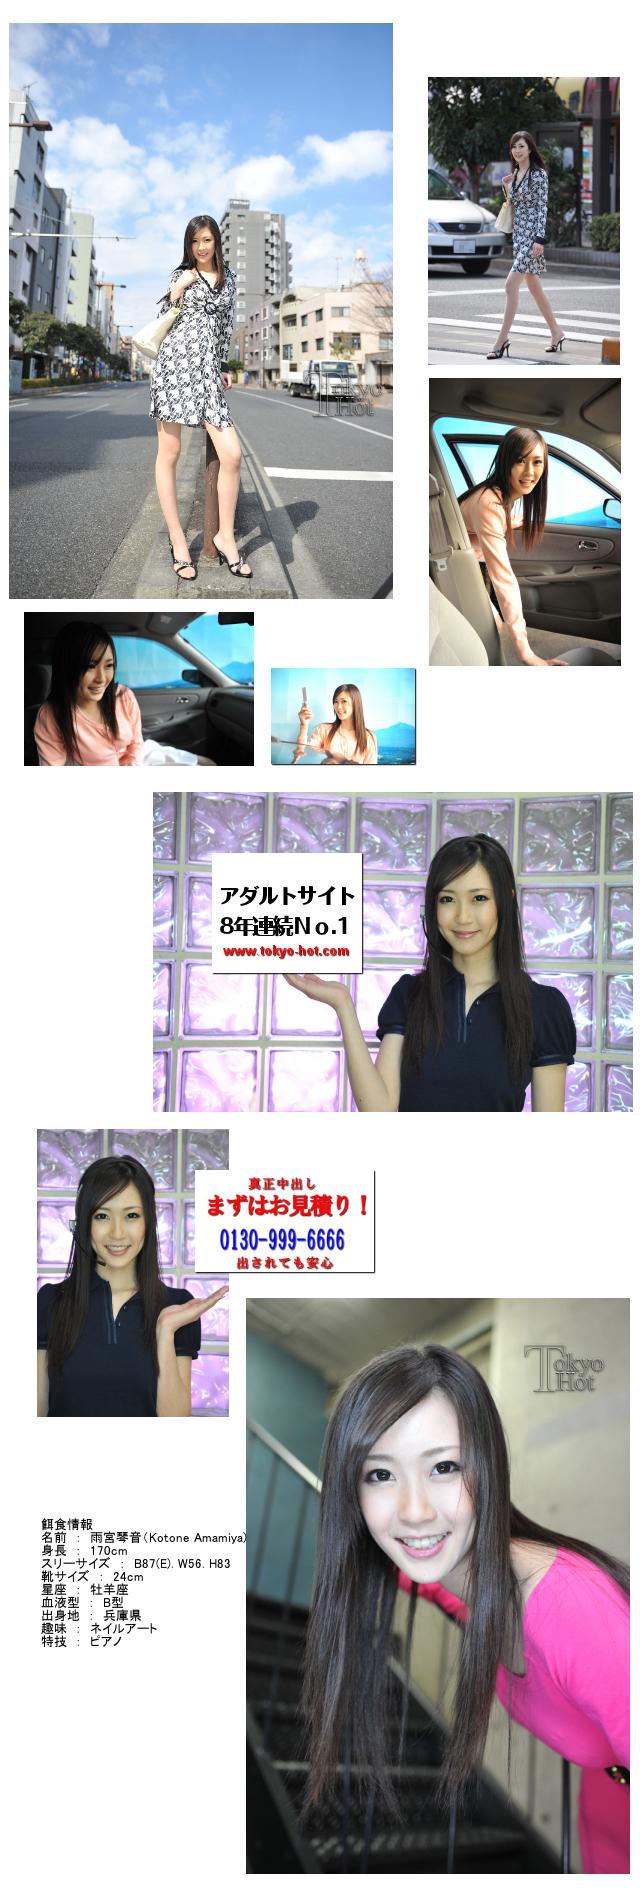 [3部]TOKYO-HOTN0594、N0604、S2M-008雨宮琴音